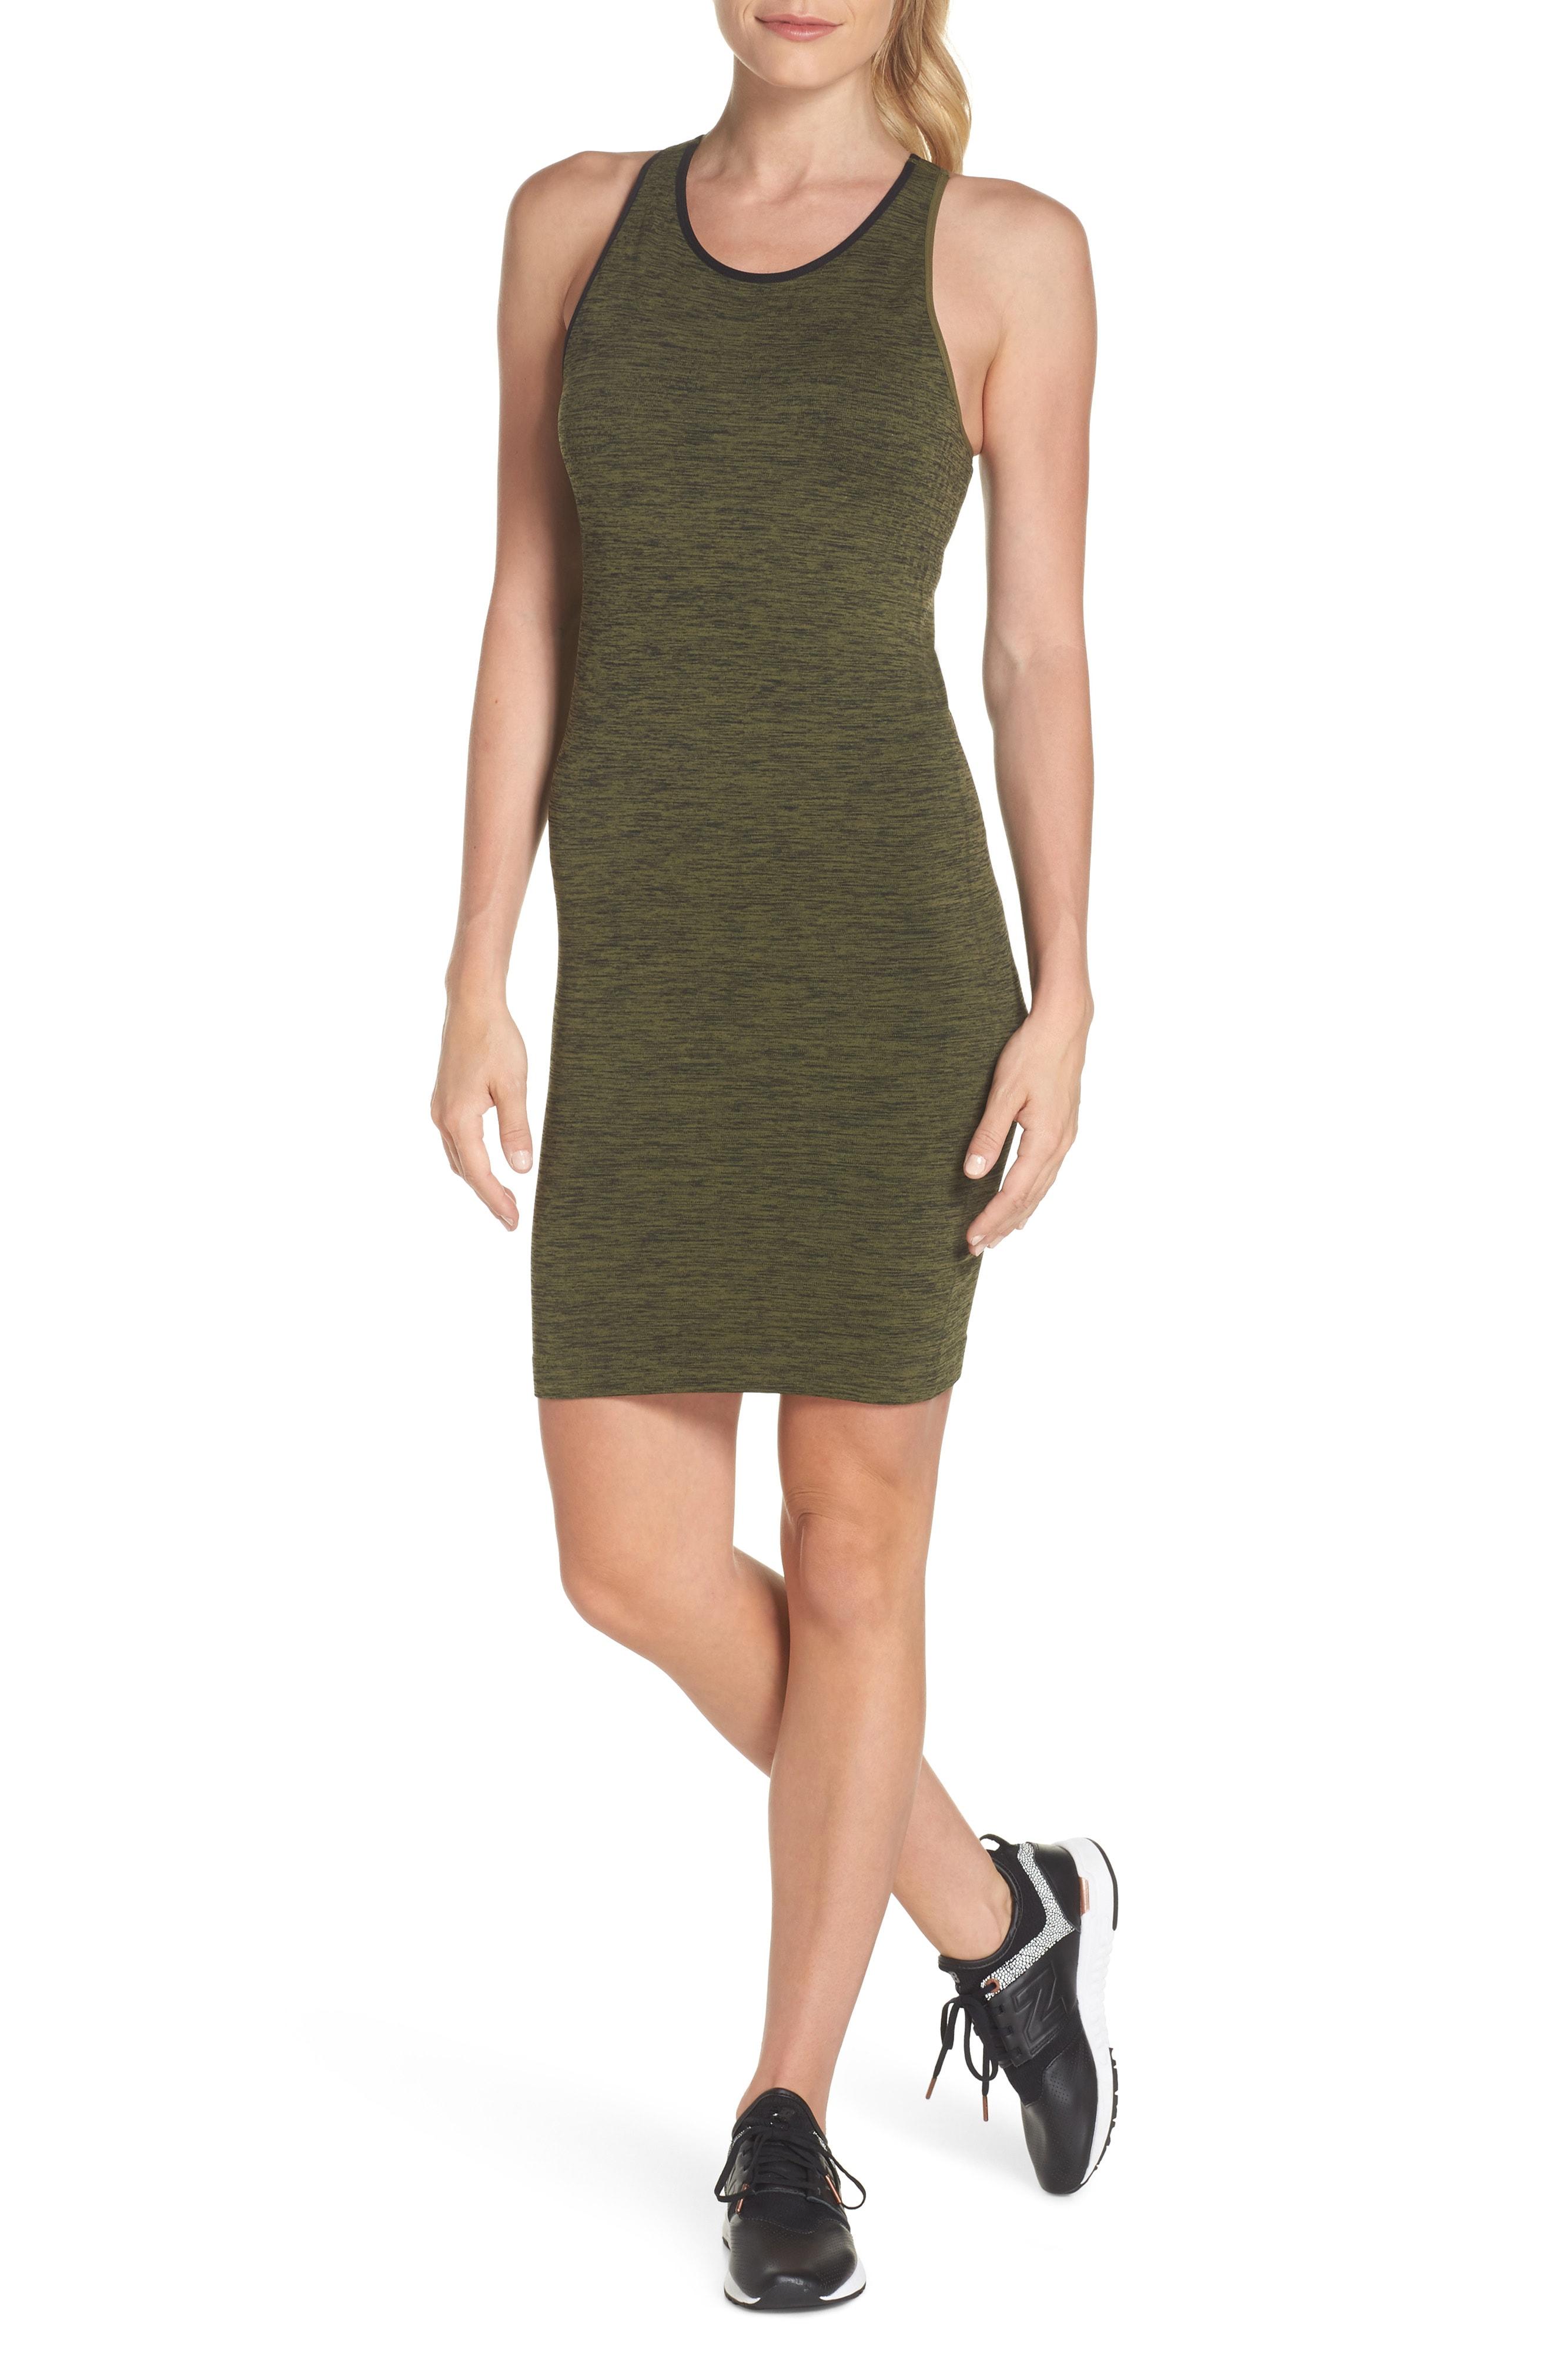 Climawear Spectrum Dress